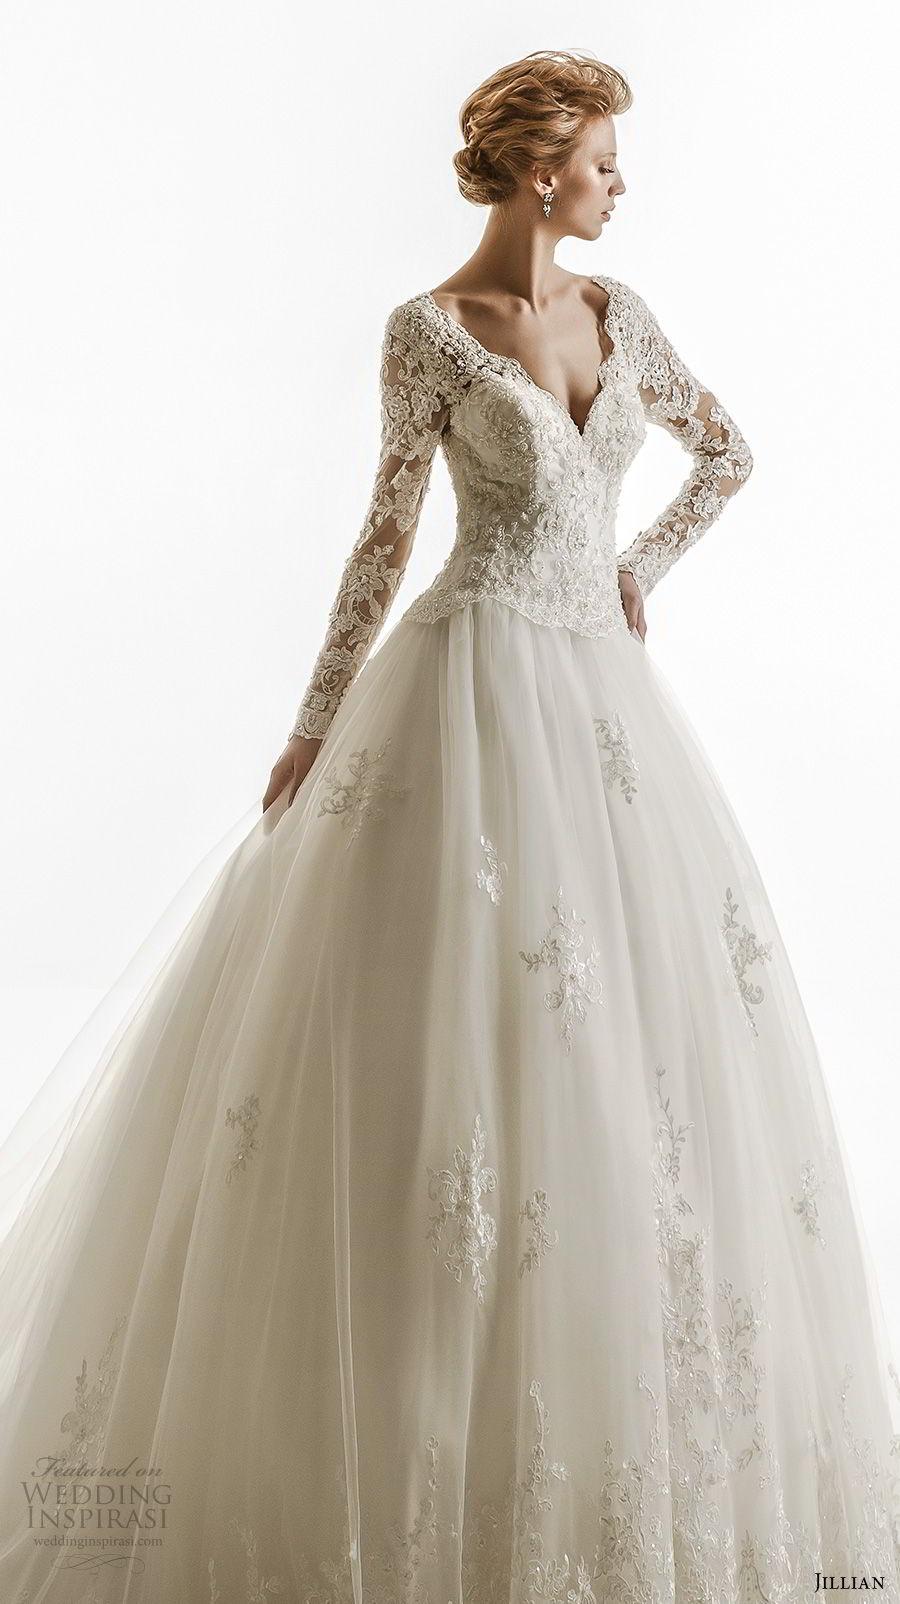 jillian 2018 bridal long sleeves v neck heavily embellished bodice elegant princess ball gown wedding dress sheer lace back royal train (25) mv